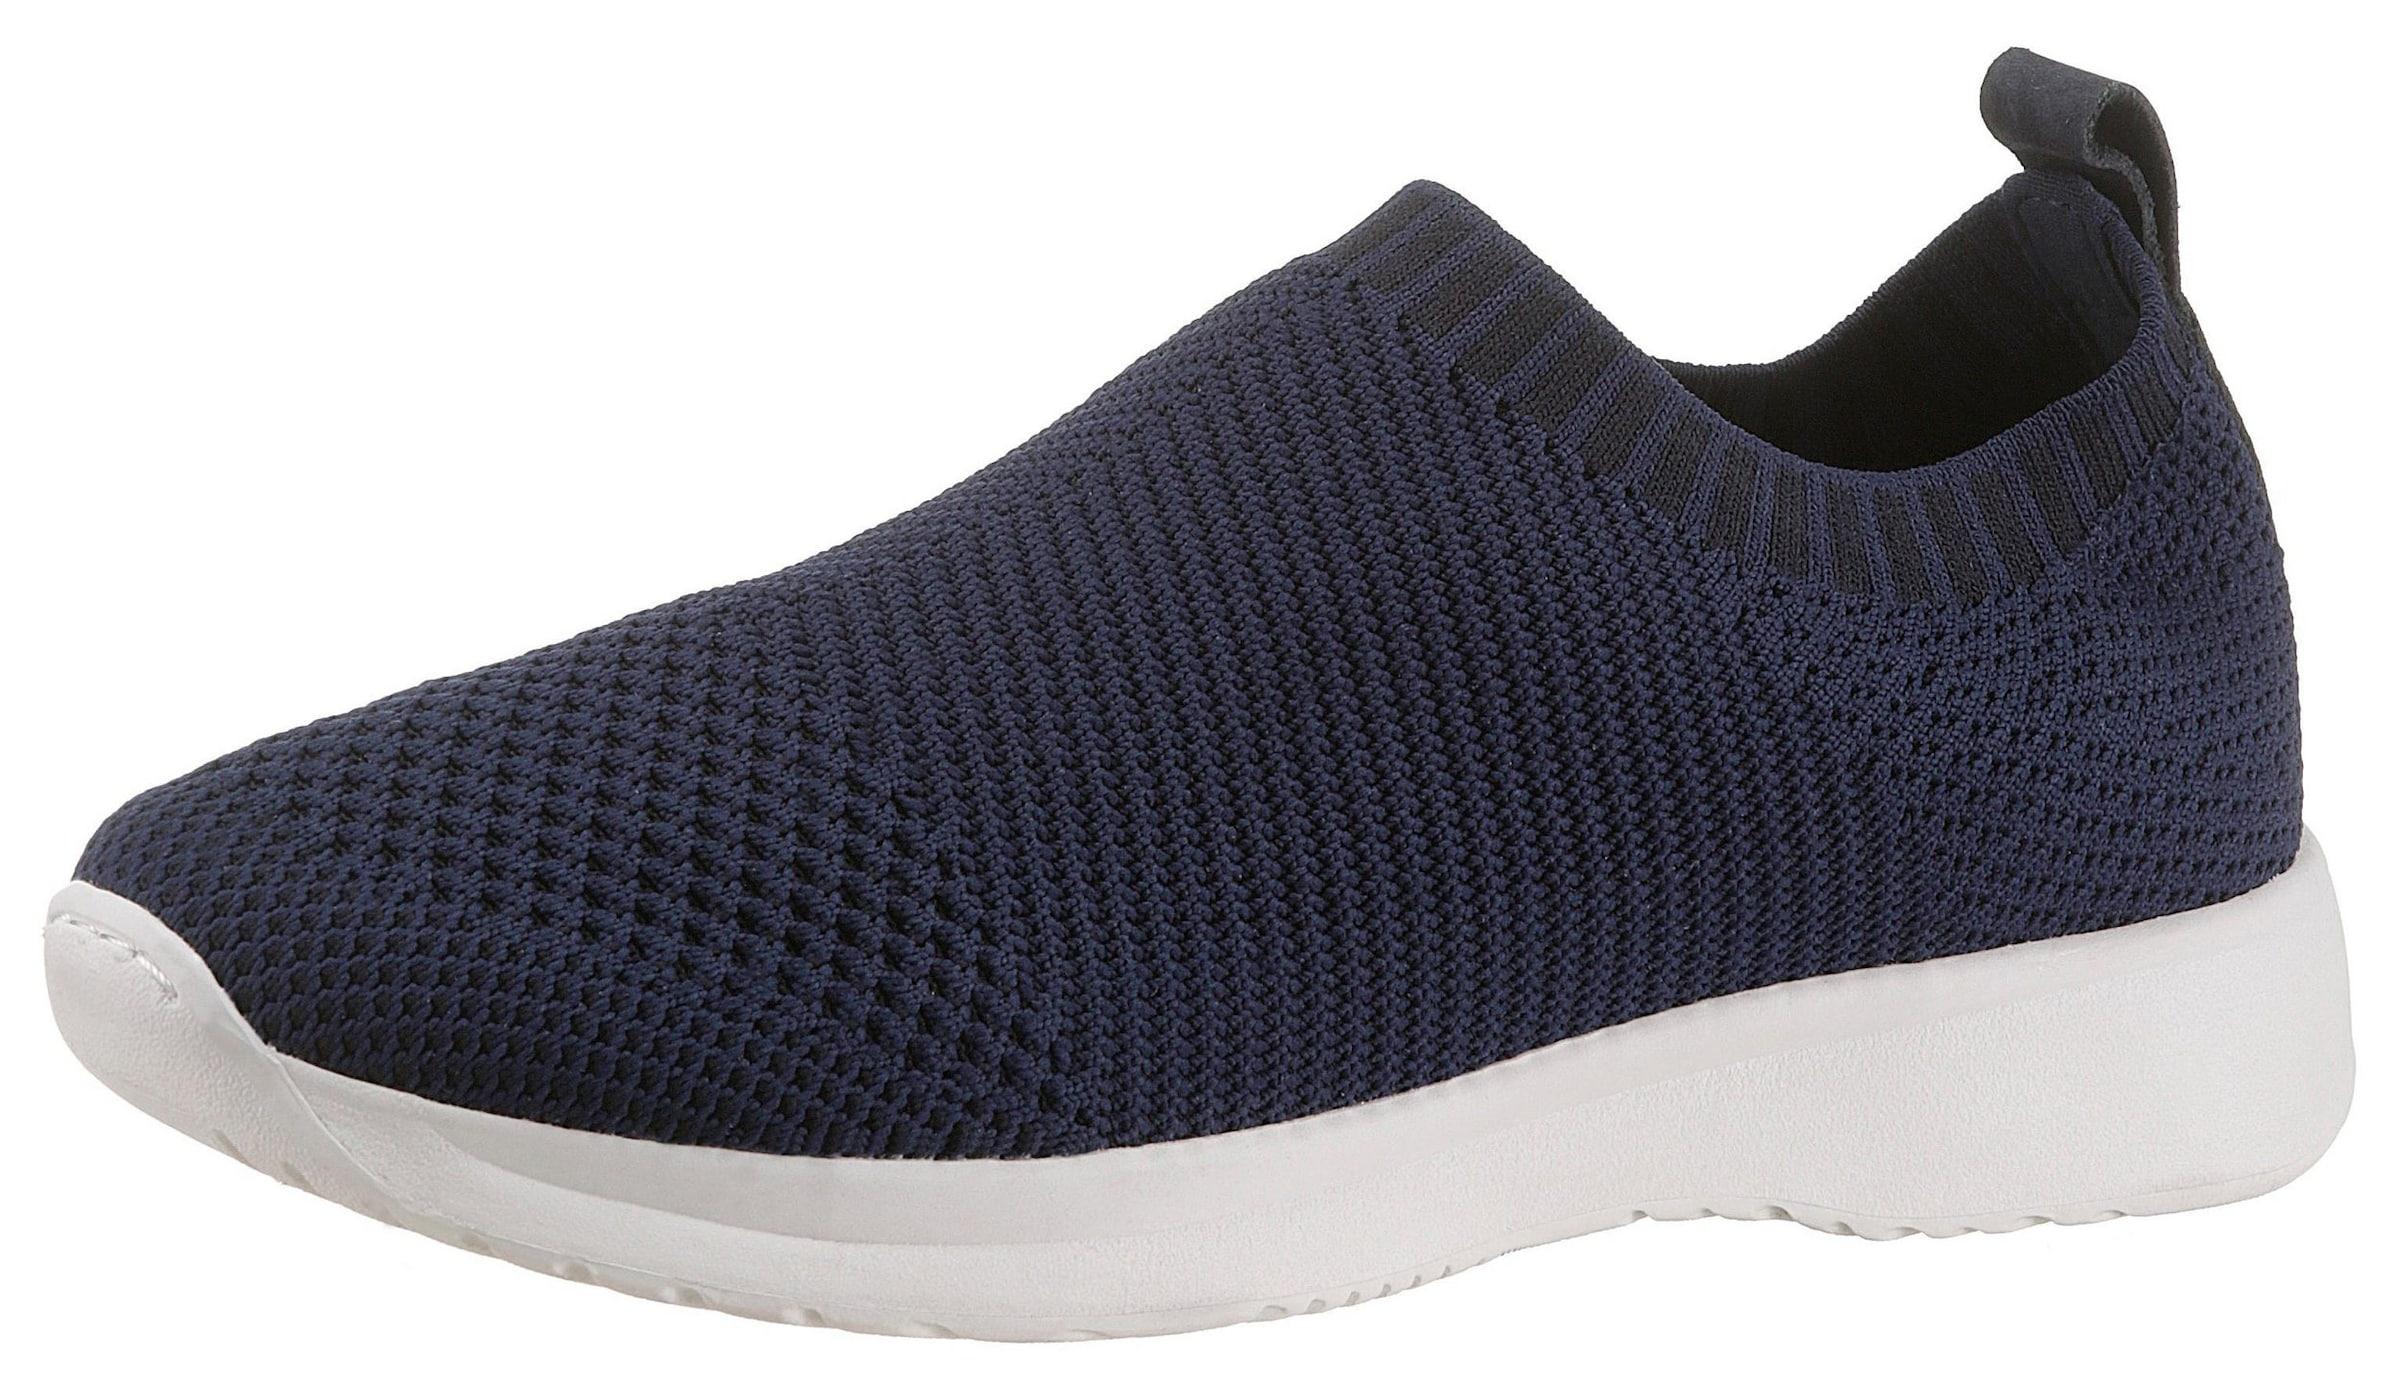 Shoemakers Sneaker In Navy Vagabond on Slip Jl3TFcK1